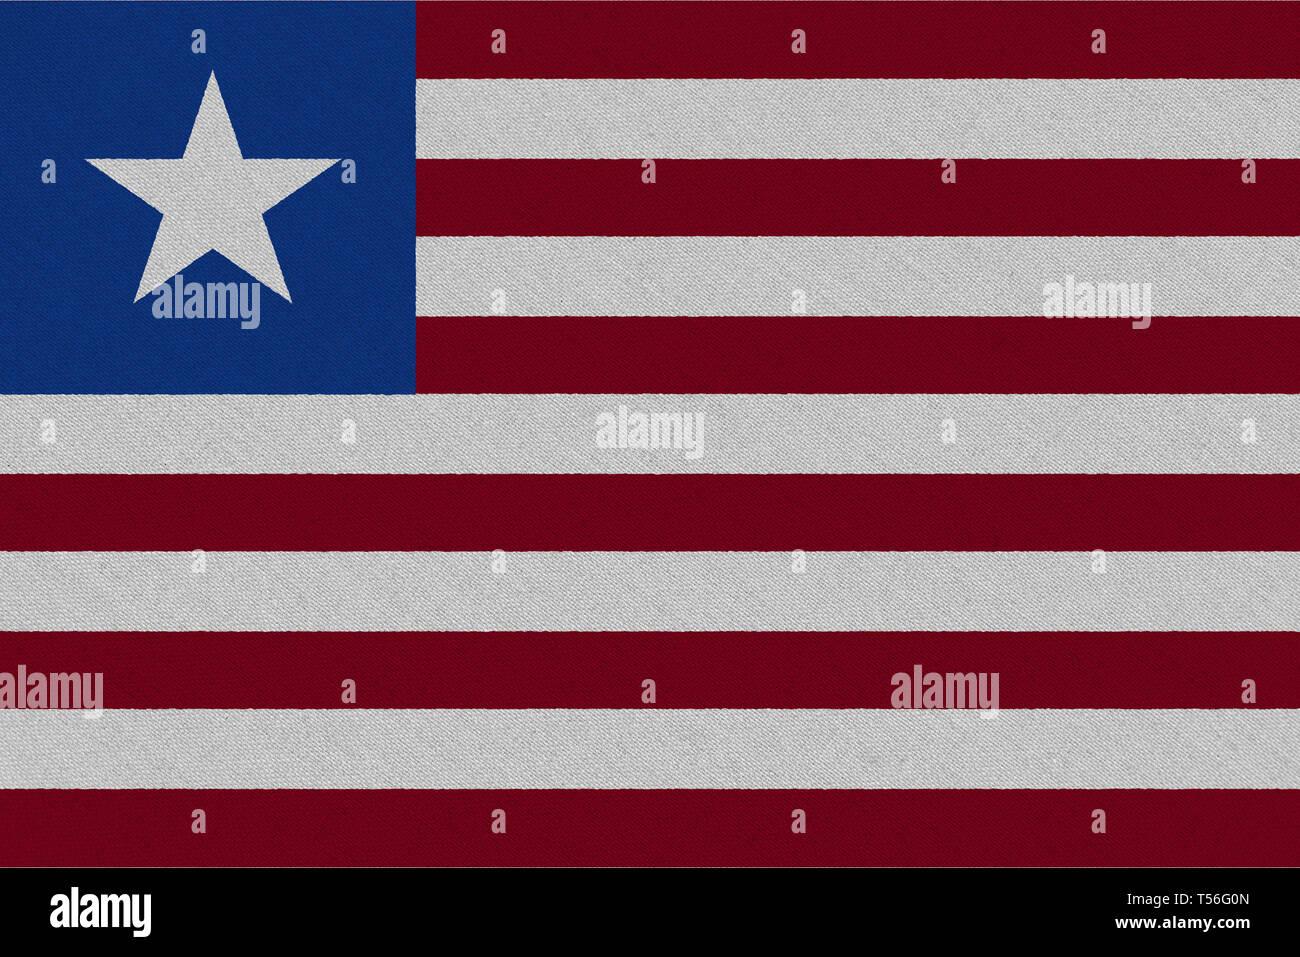 Liberia fabric flag. Patriotic background. National flag of Liberia - Stock Image